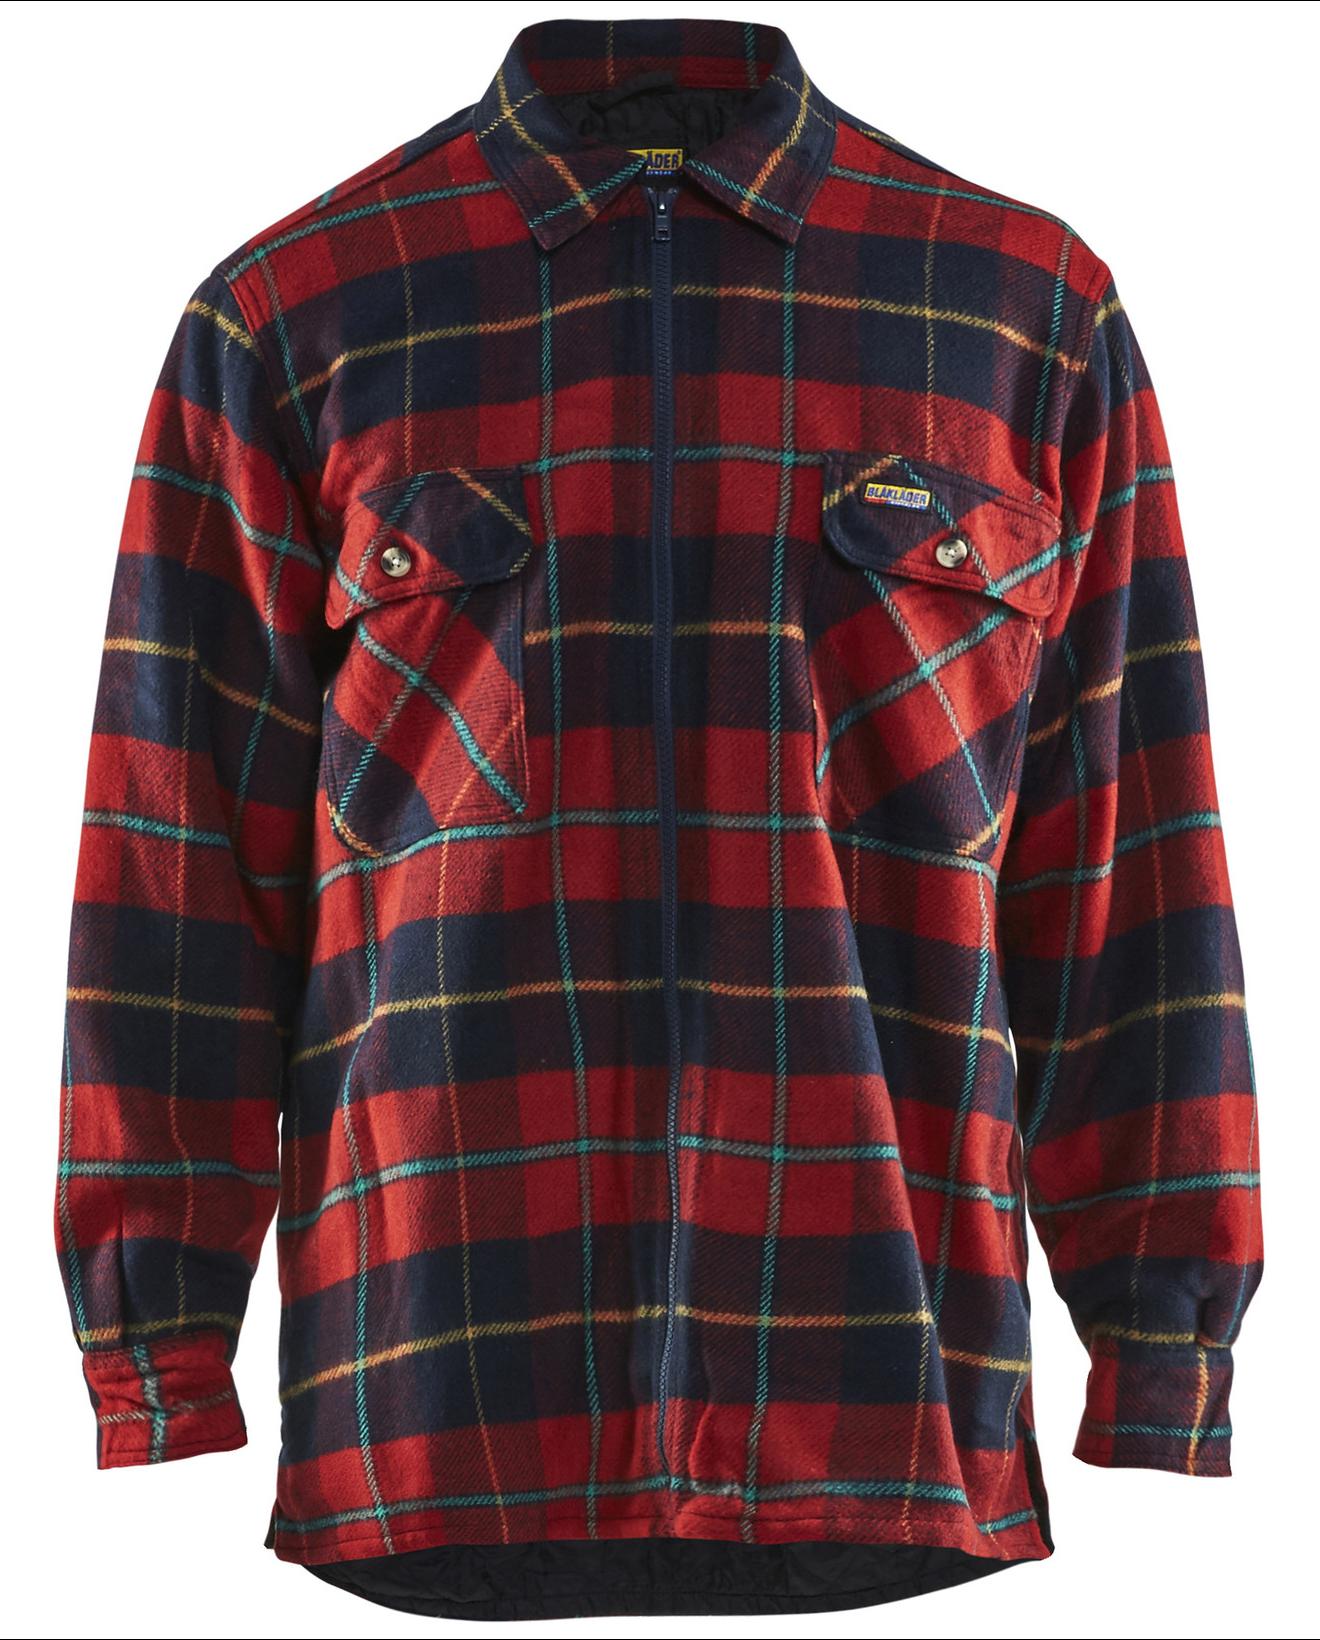 Flanellen Overhemd.Gevoerde Flanellen Overhemd